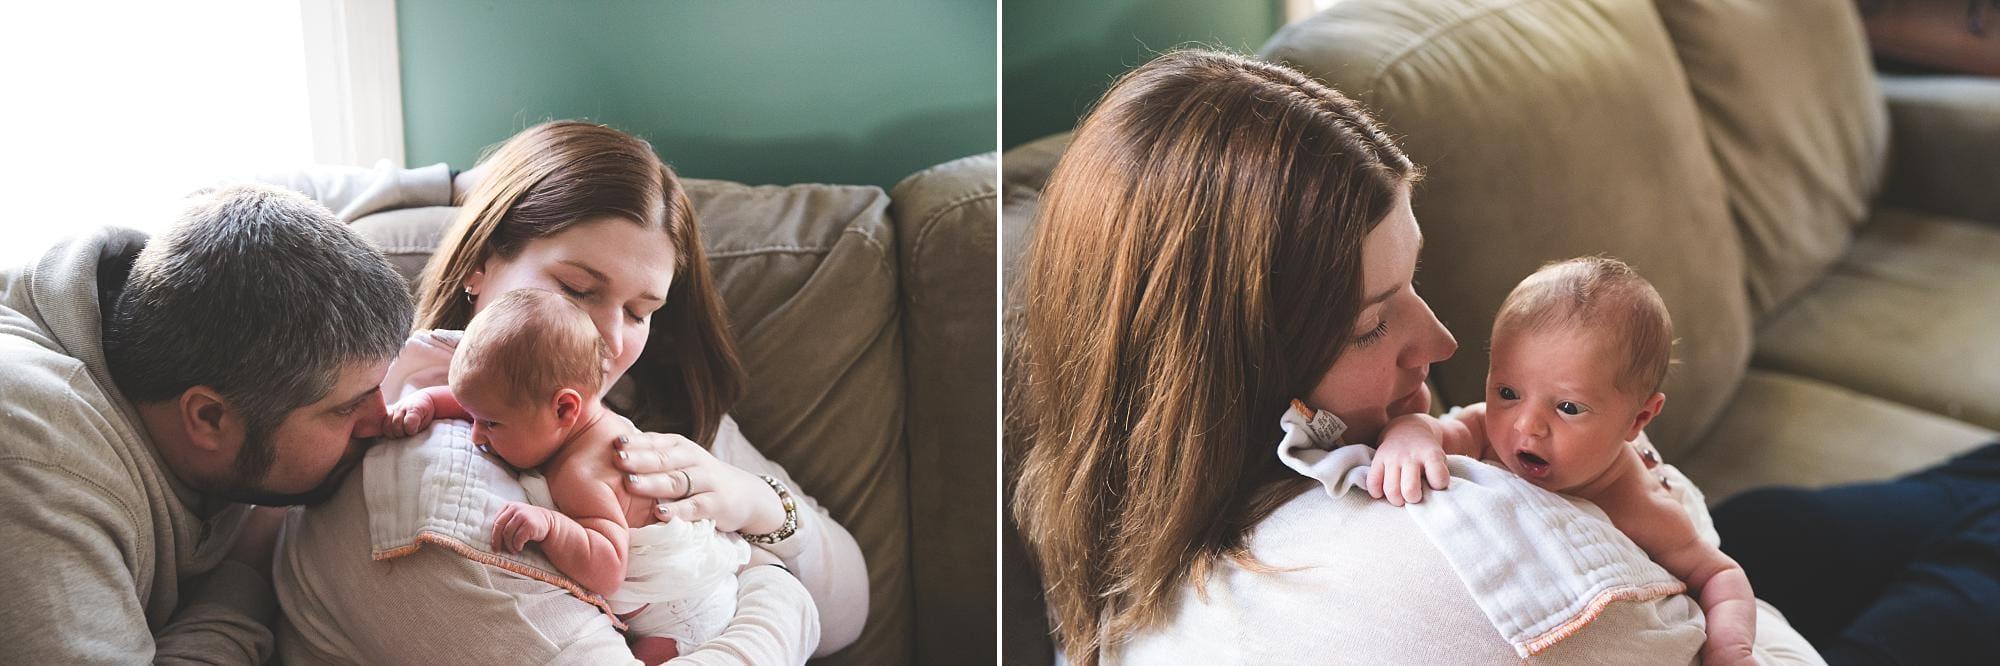 mom-dad-newborn-on-shoulder-lifestyle